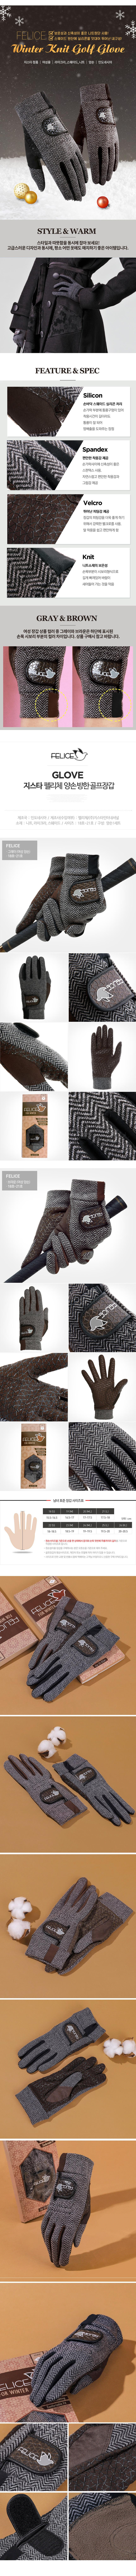 felice_mw_winter_glove_17_w.jpg